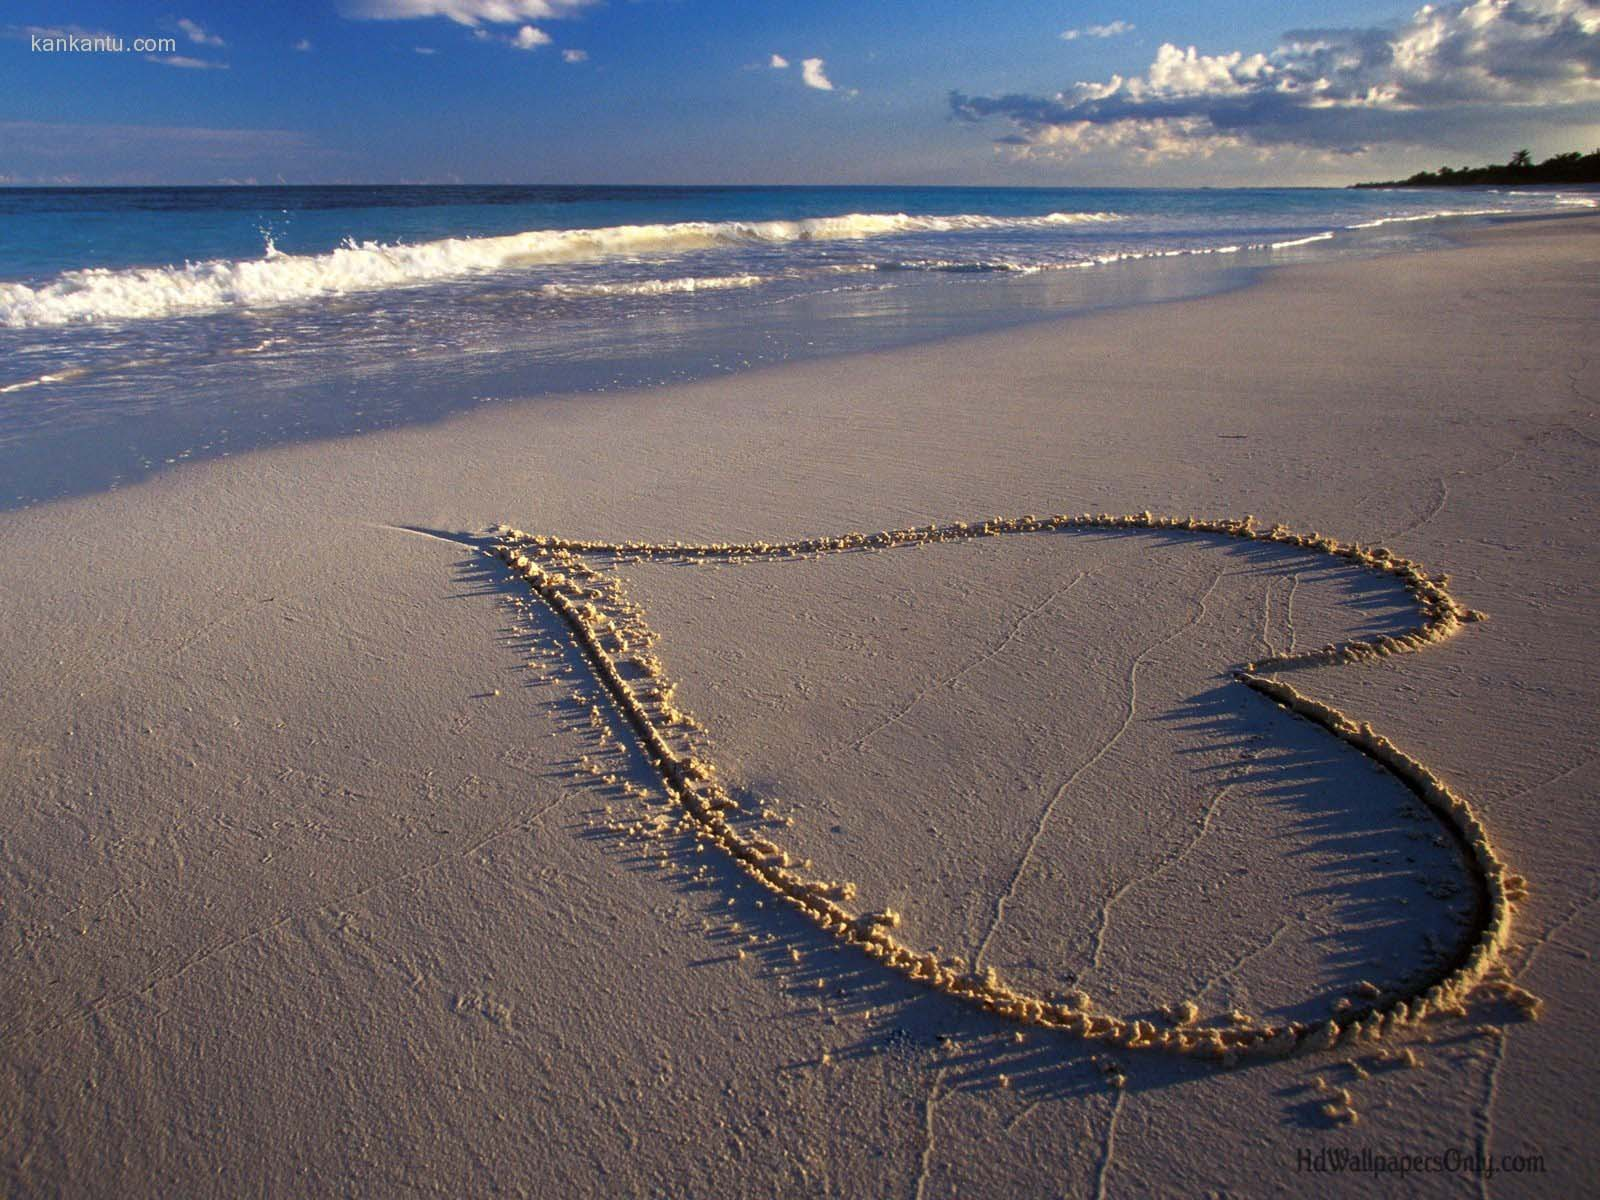 Valentine Love In Beach Wallpaper HD Wallpaper with 1600x1200 1600x1200